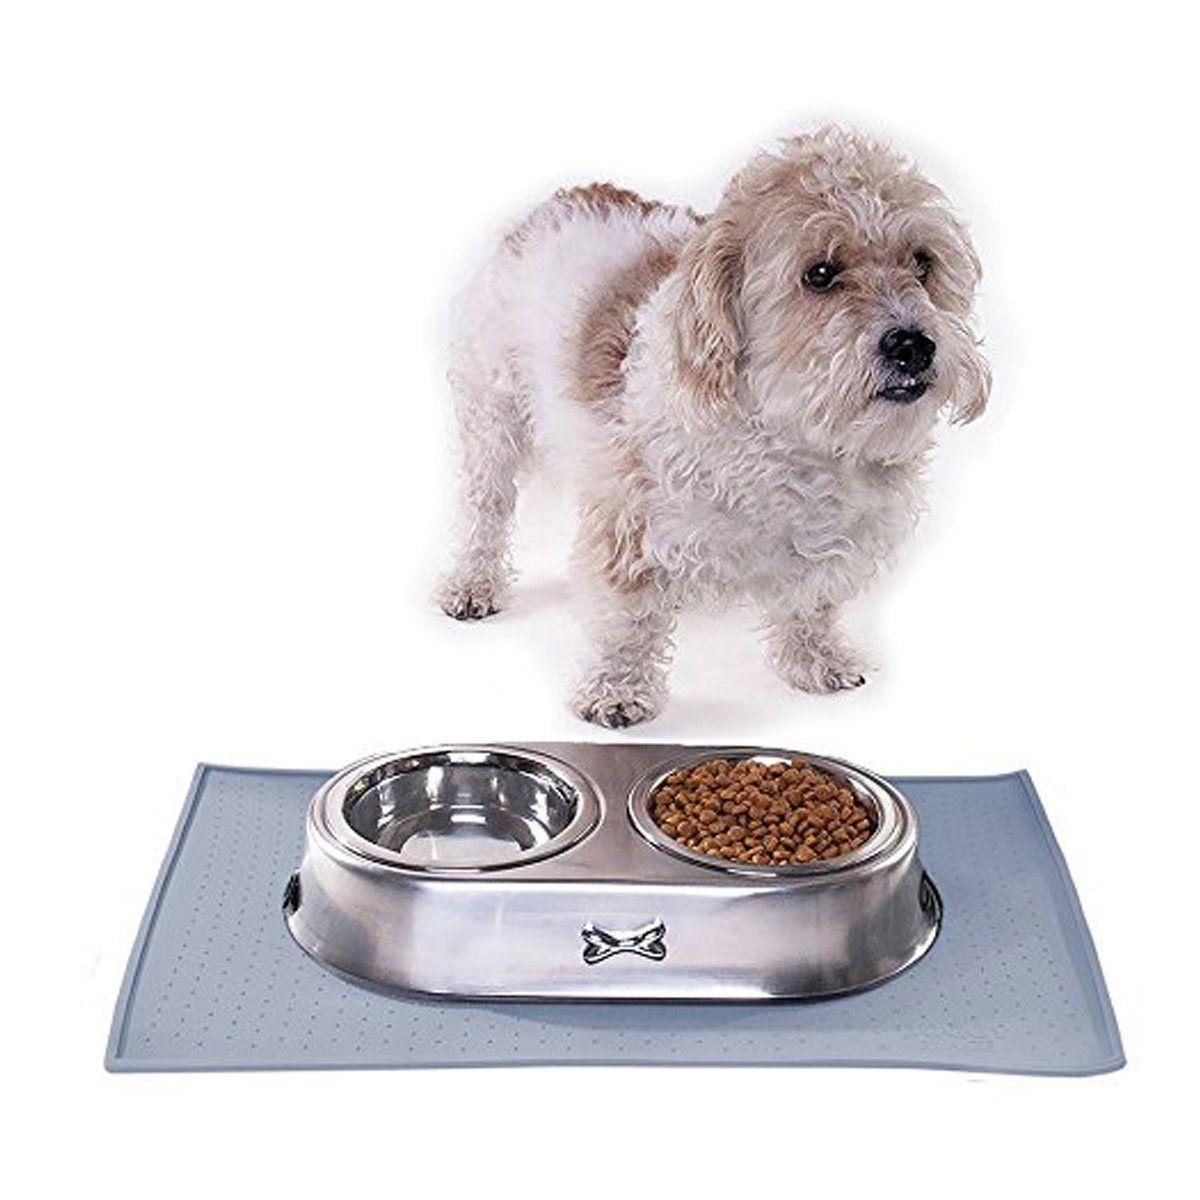 Dog Mat Yonkon Fda Grade Non Slip Waterproof Pet Food Placement